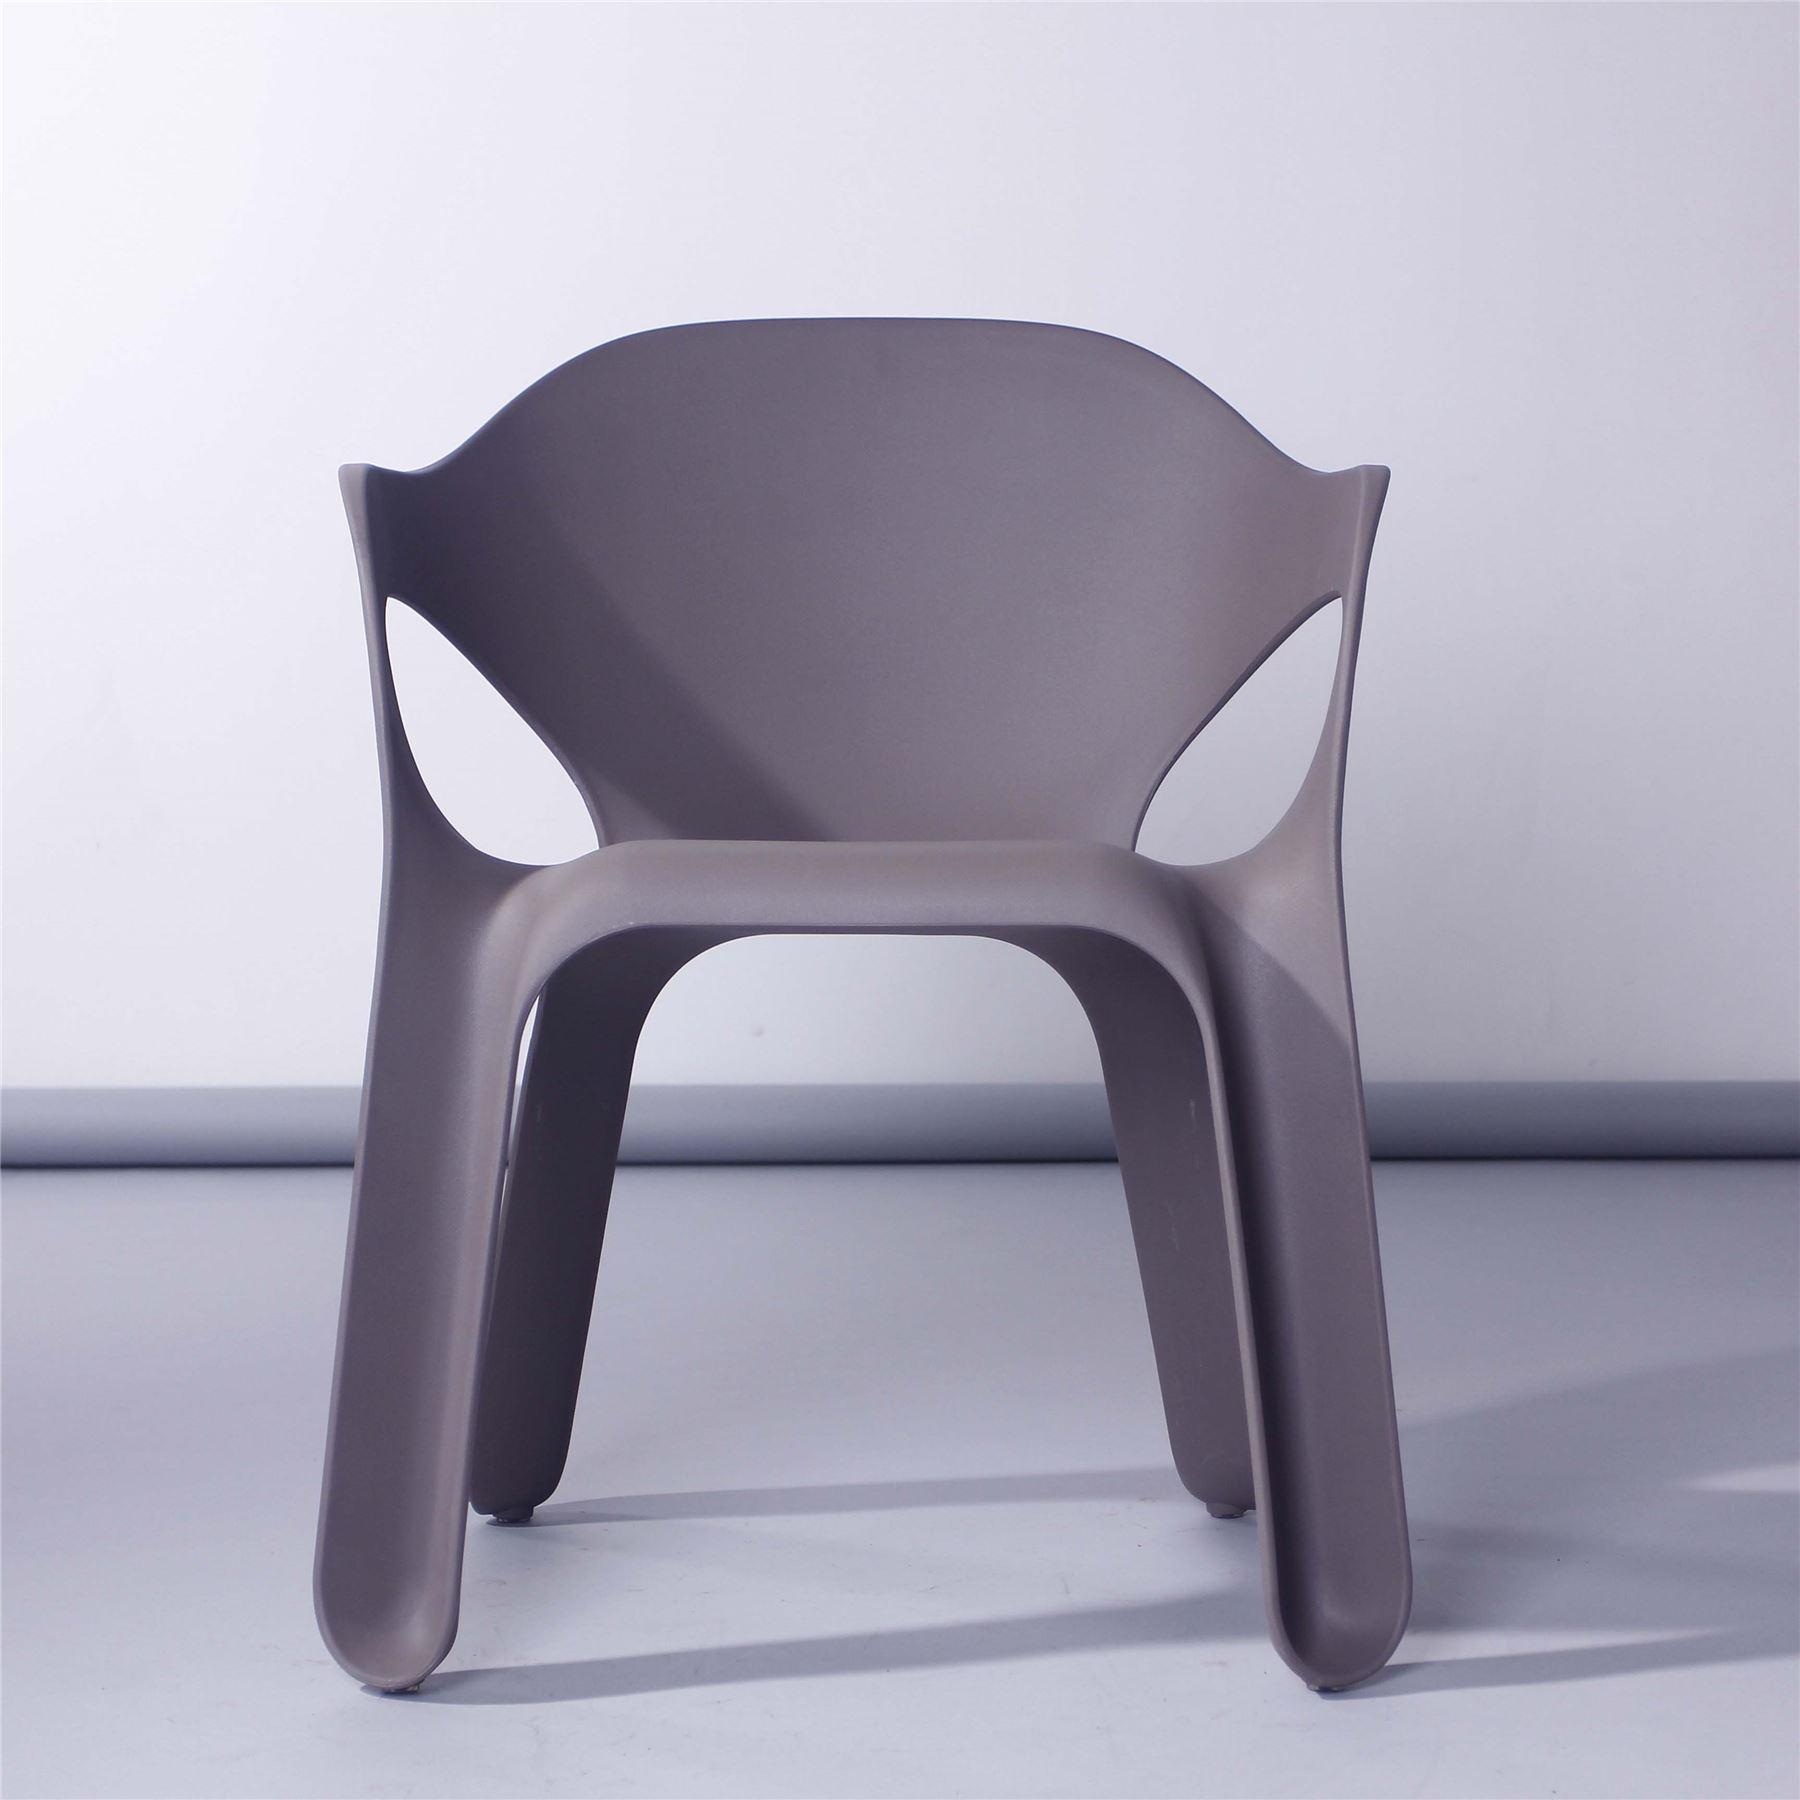 Magis Easy Chair Replica Plastic Funky Garden Chair Stackable